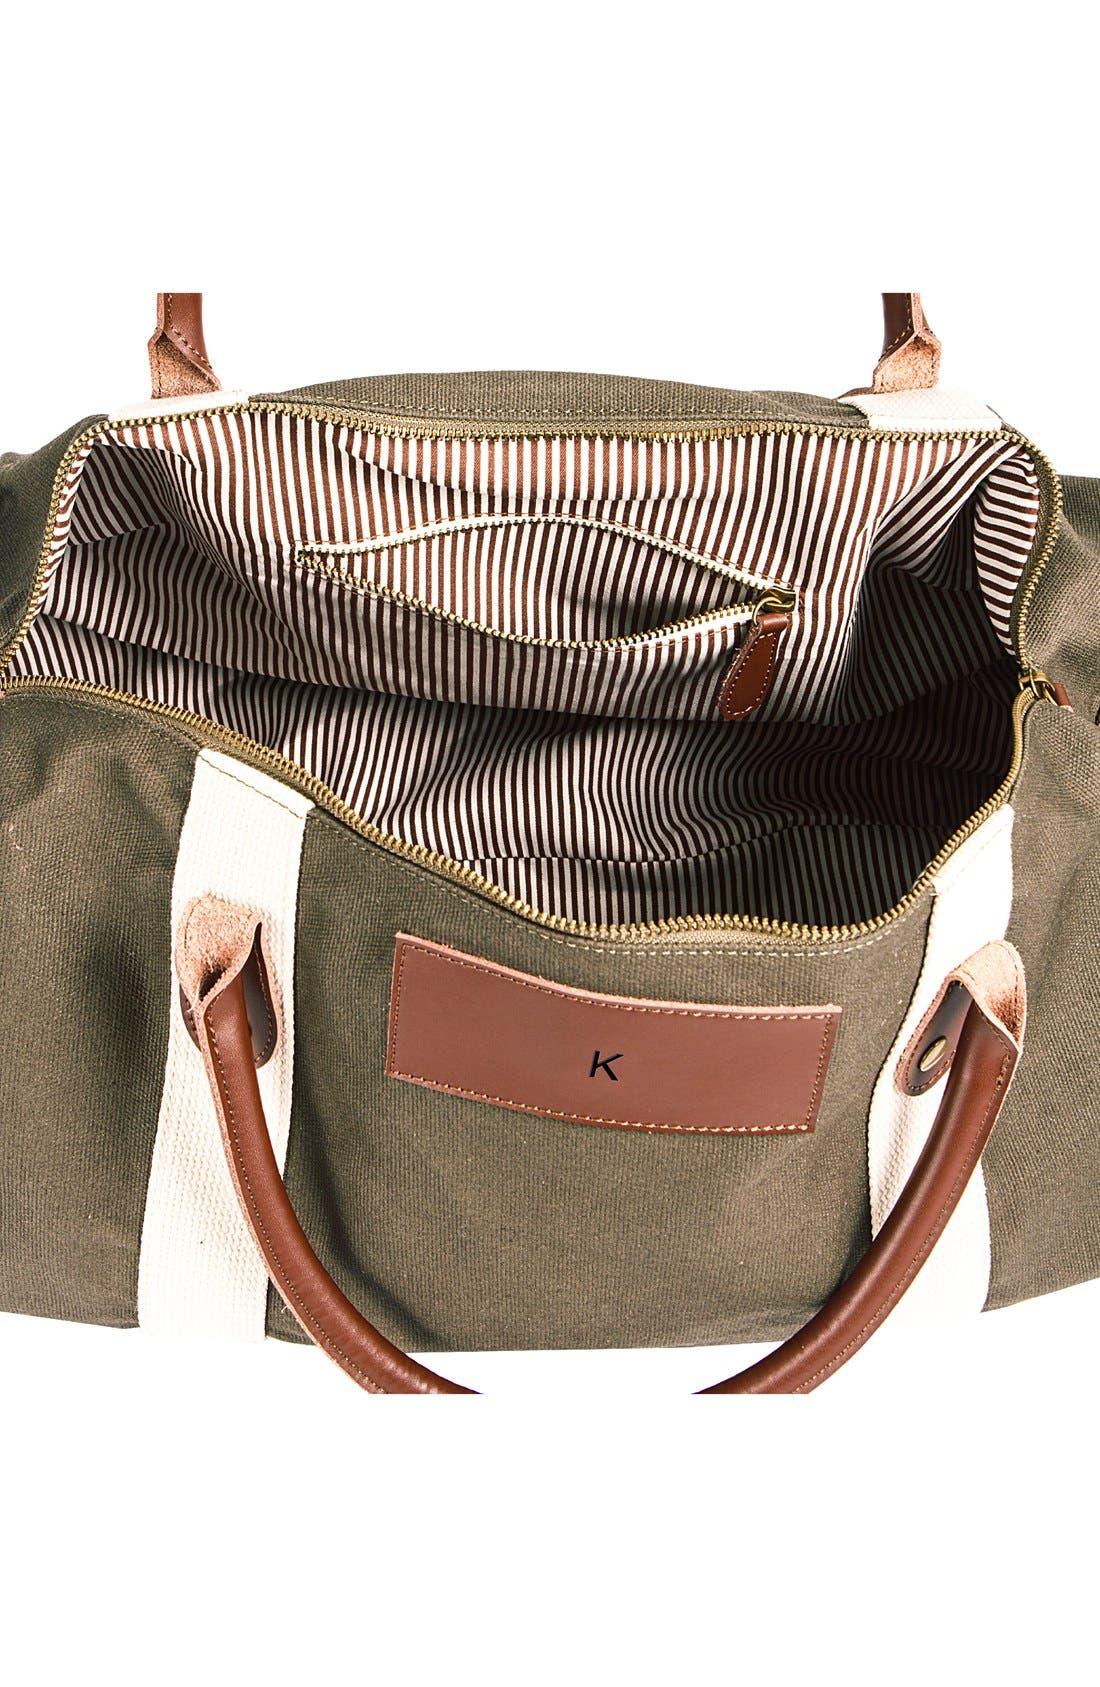 Alternate Image 2  - Cathy's Concepts Monogram Duffel Bag